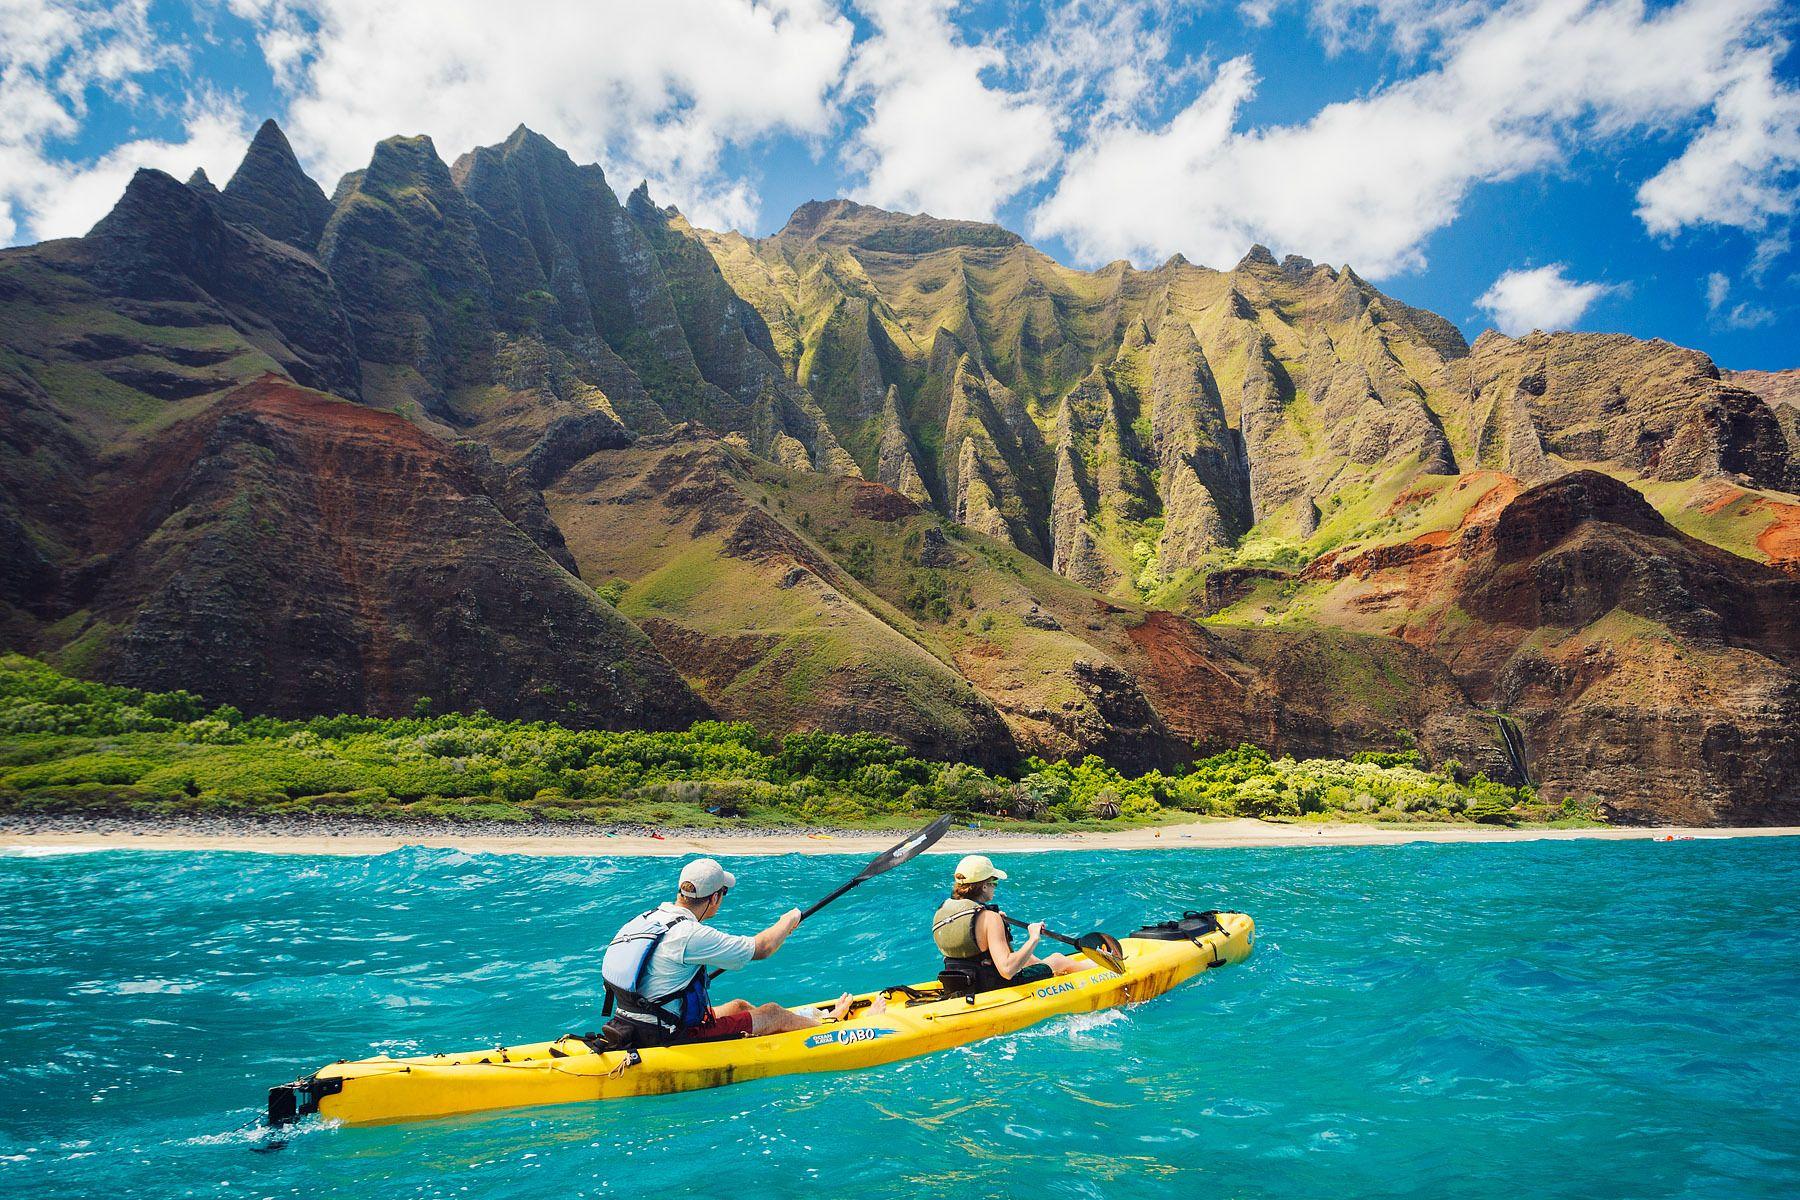 kauai's na pali coast   travel   kauai, napali coast kauai, hawaii